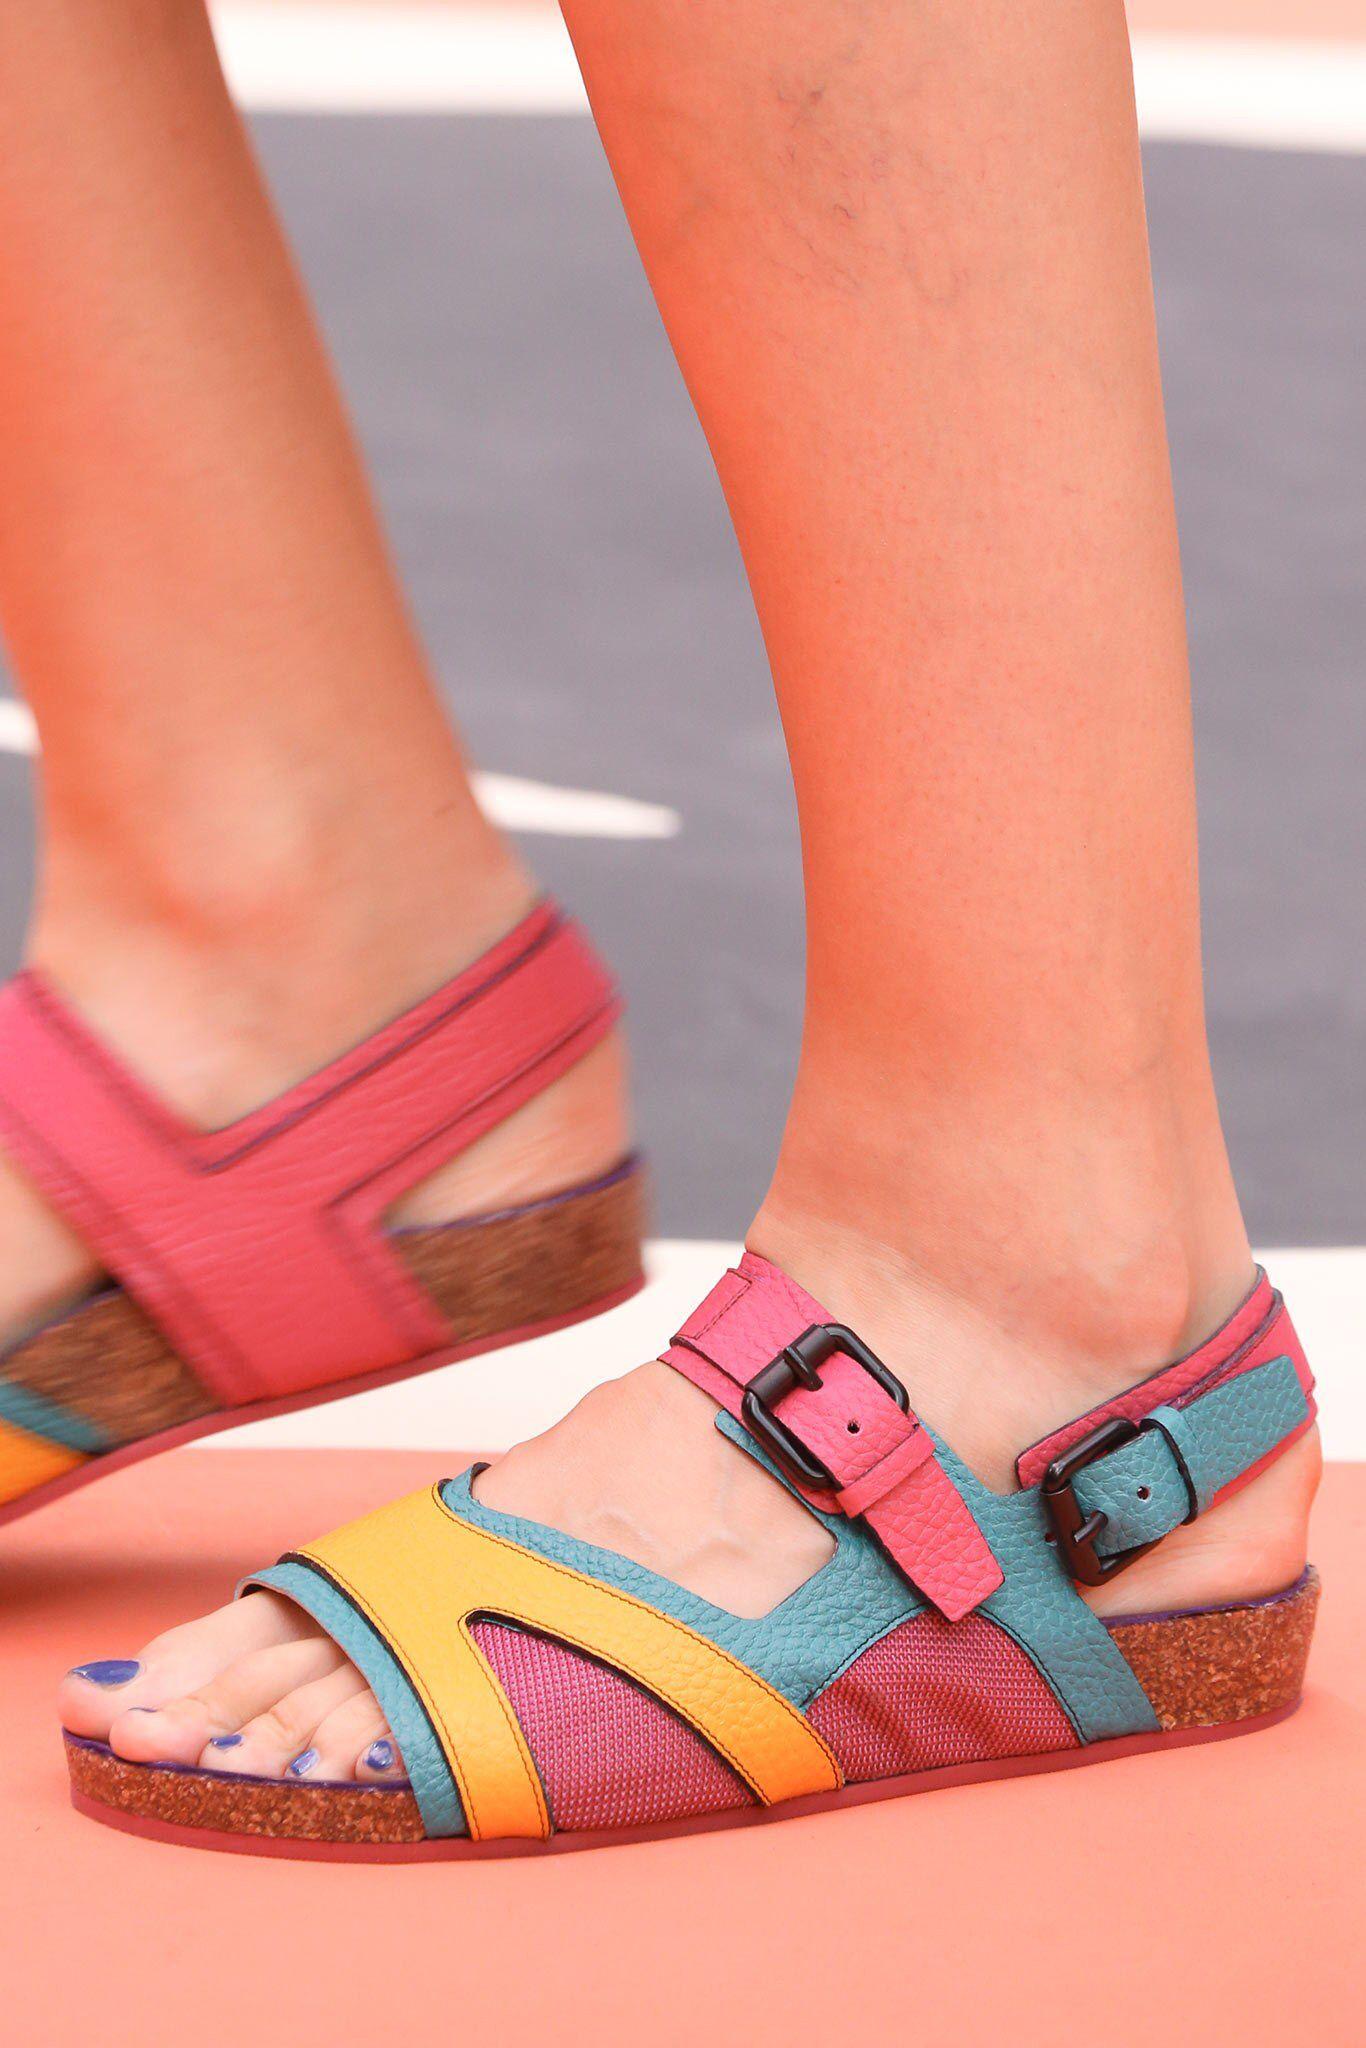 Burberry Prorsum Spring 2015 Ready-to-Wear Fashion Show Details